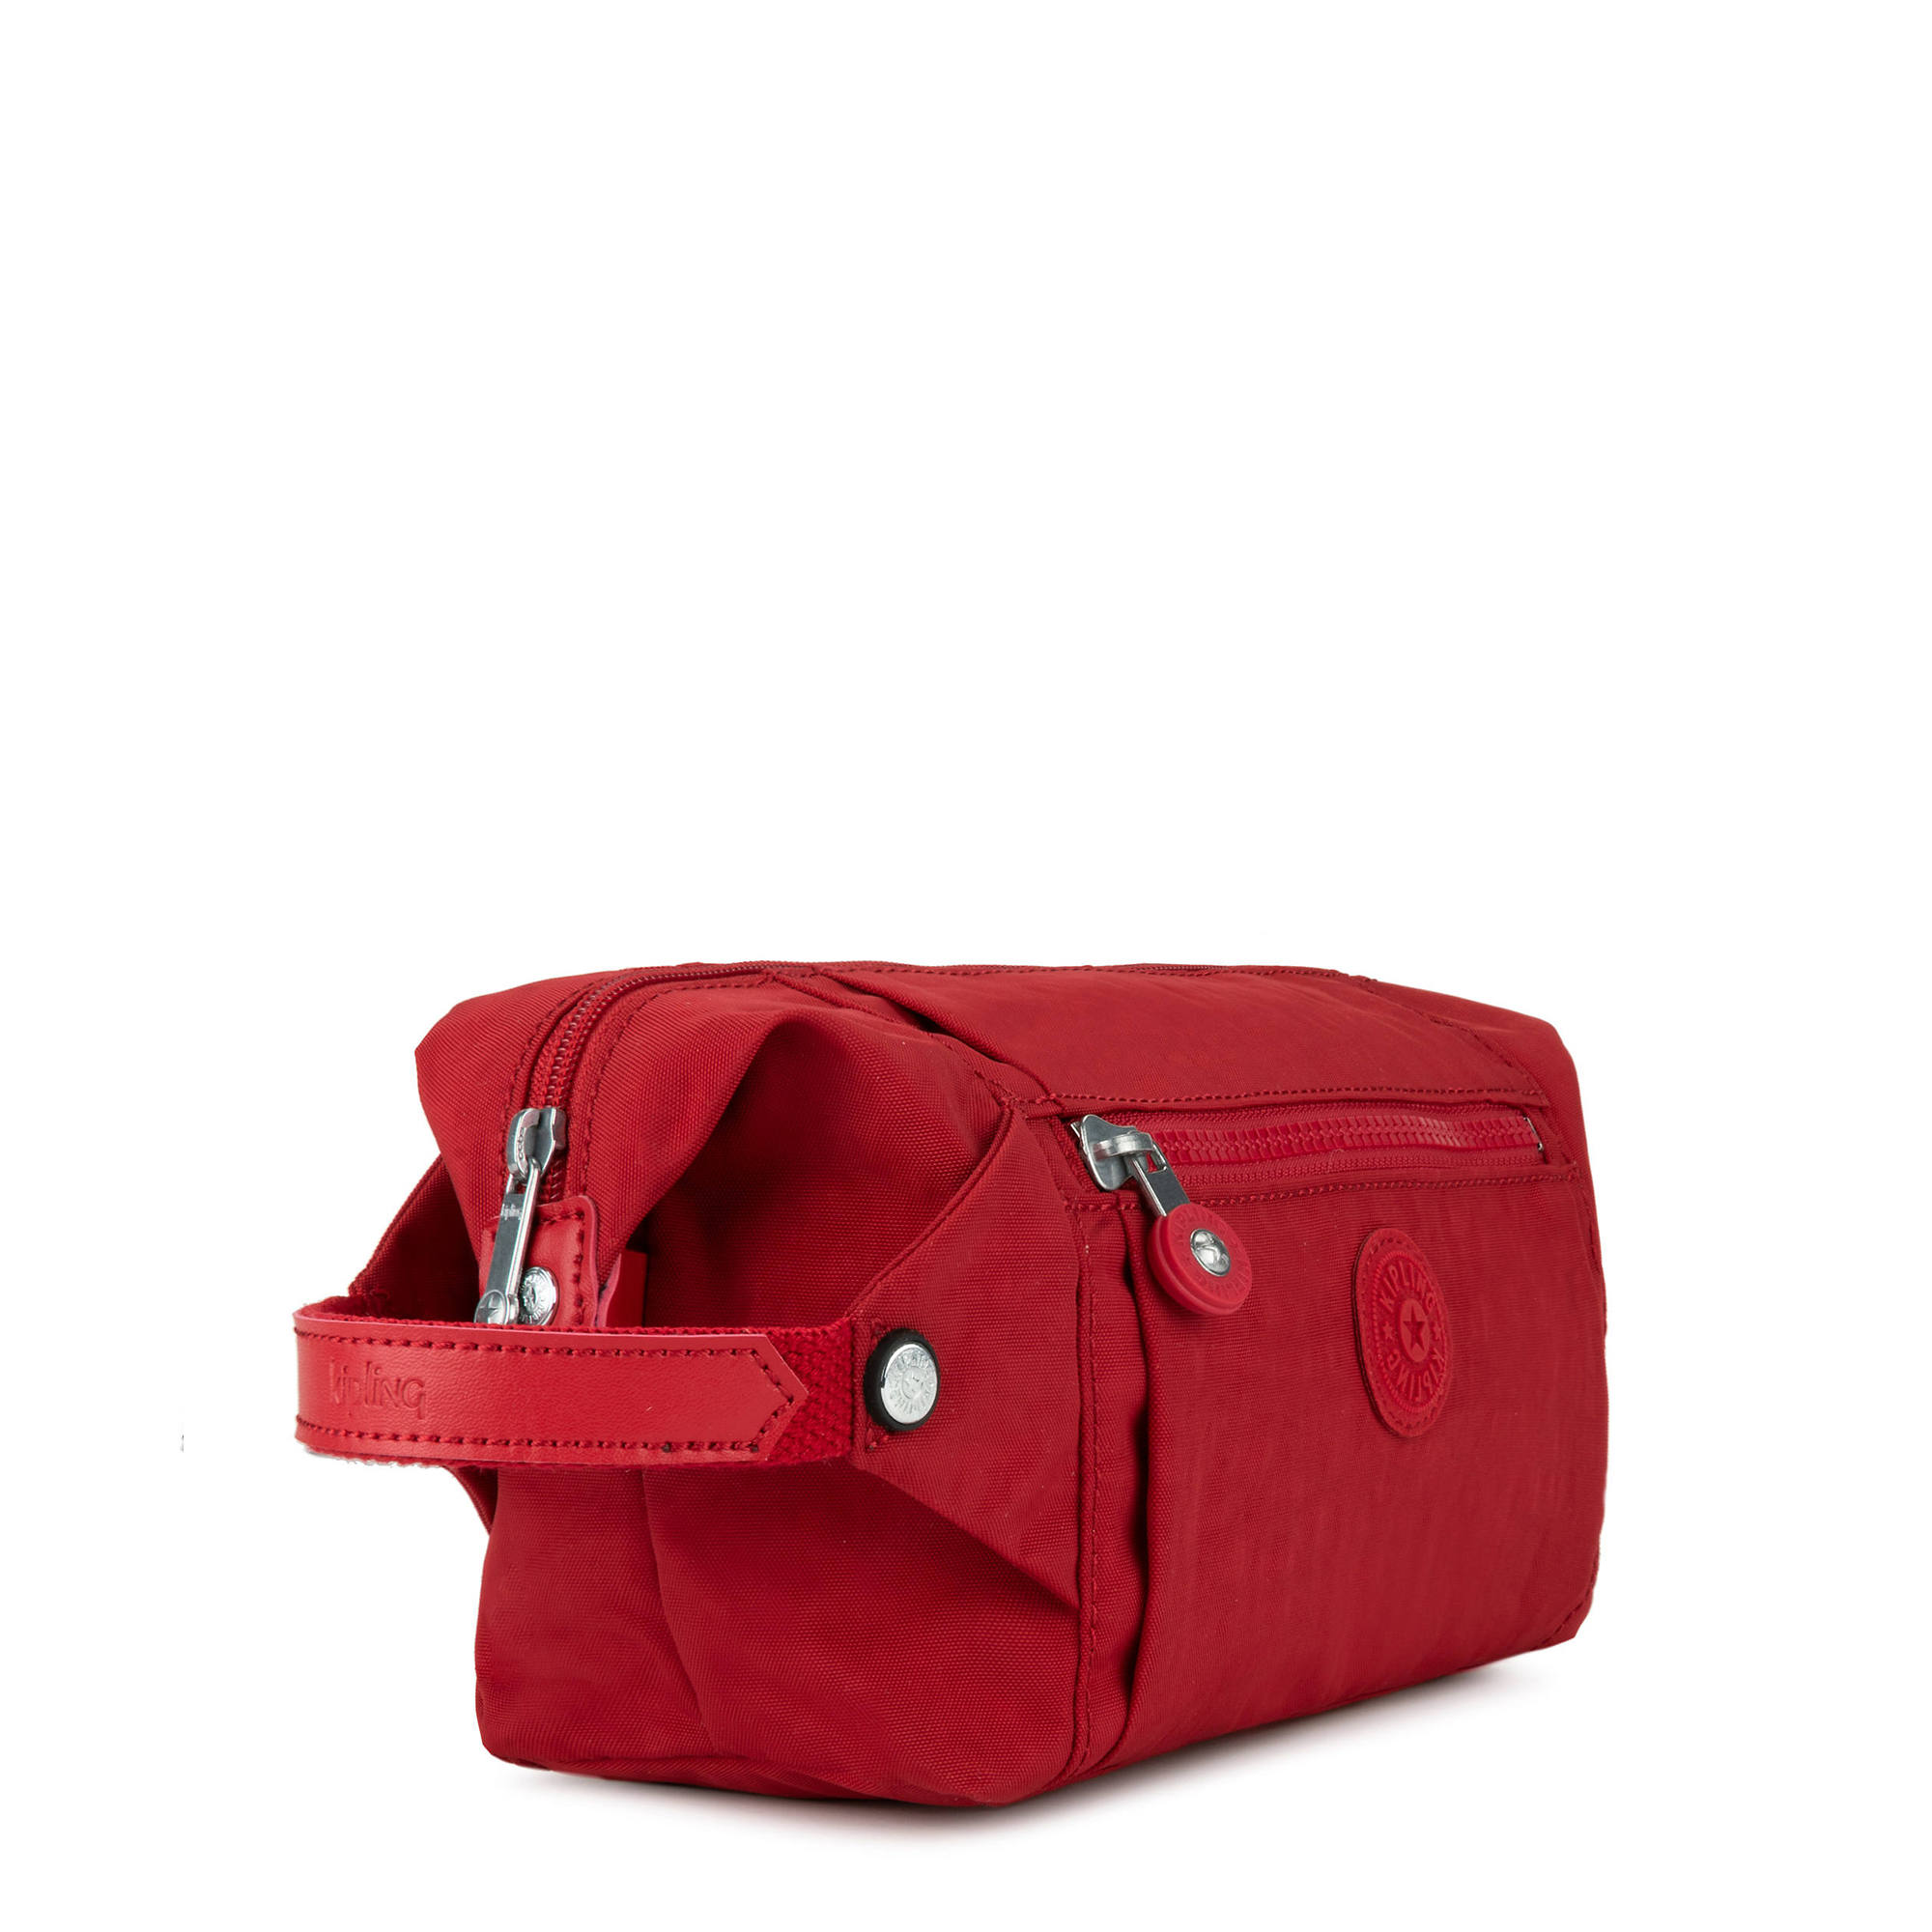 Aiden Toiletry Bag,Cherry,large c2fa0afcbd